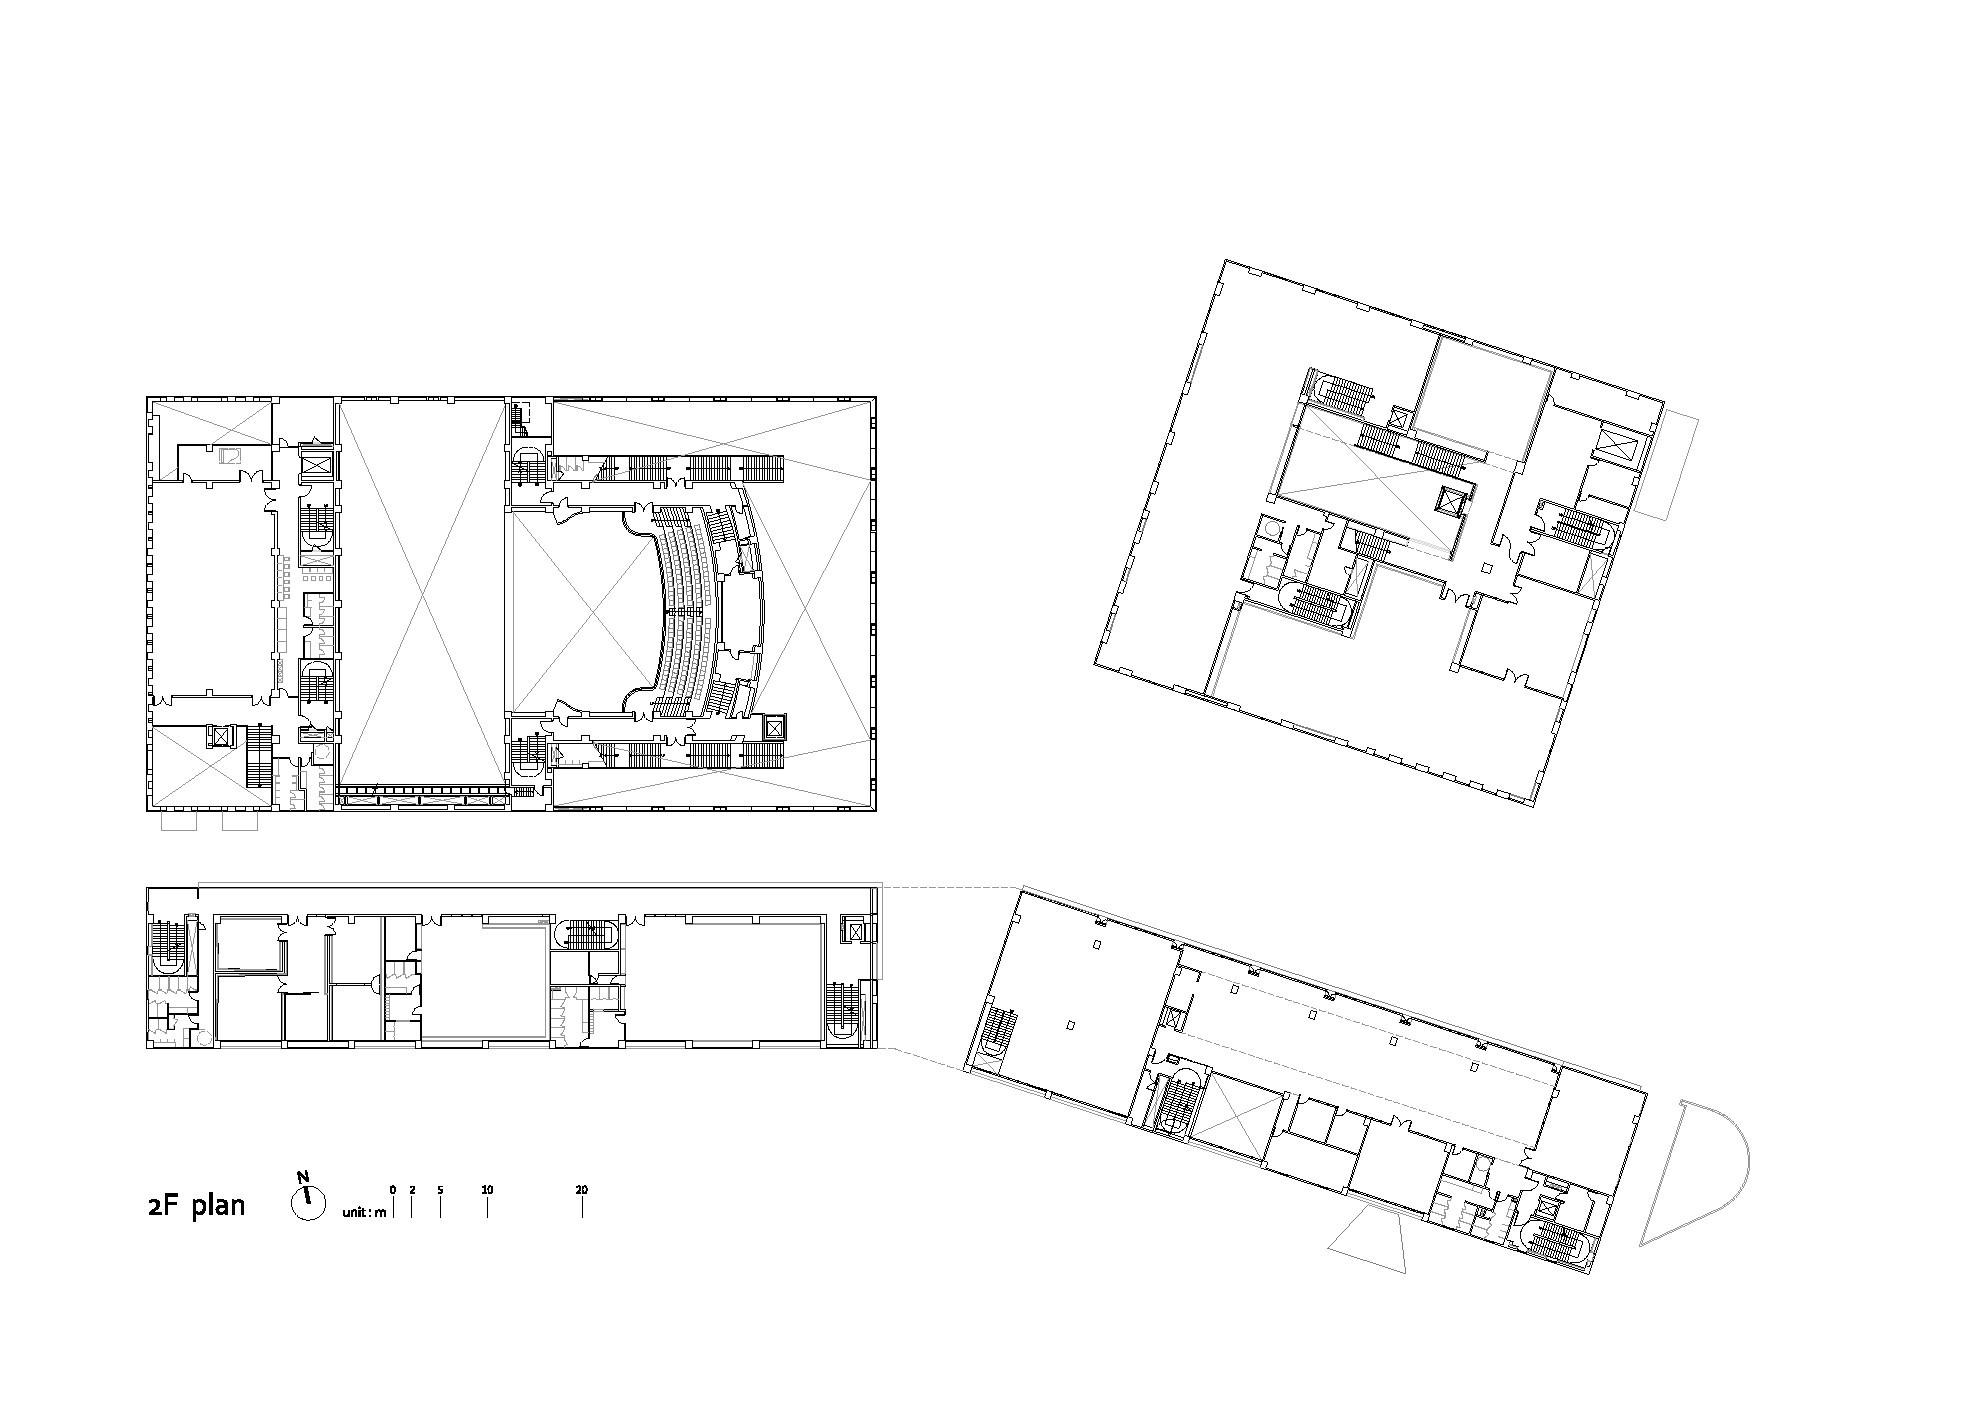 Dadong Art Center / Cie + MAYU architects